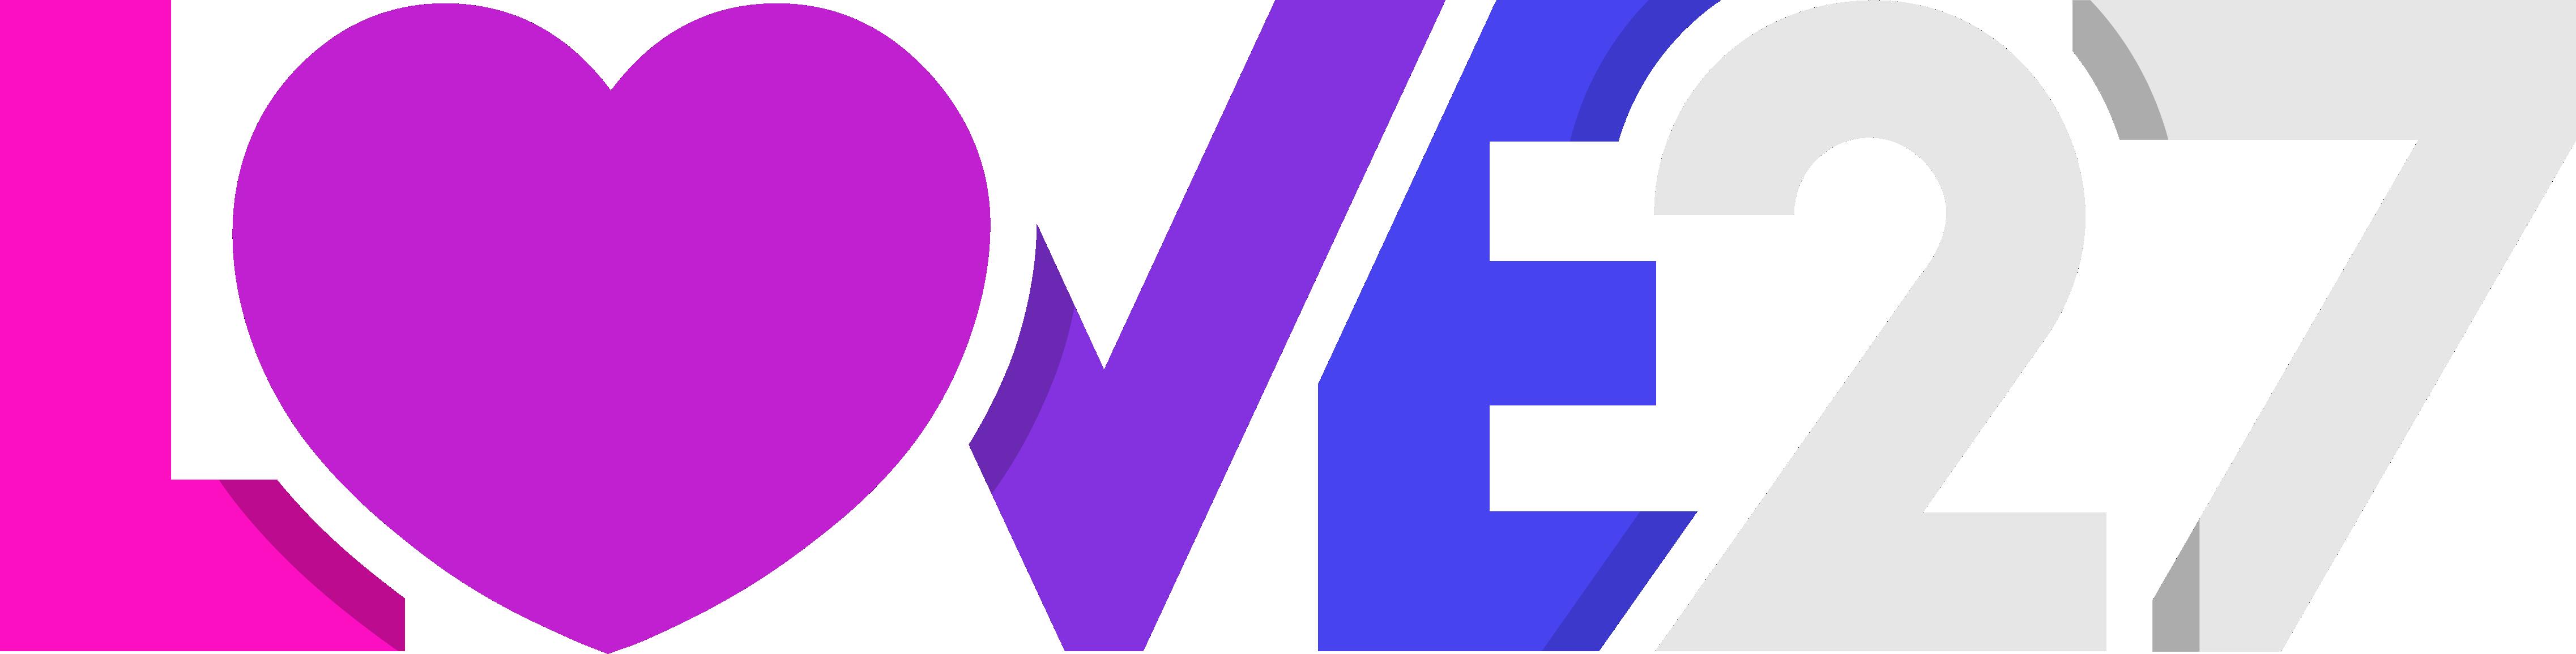 Love 27